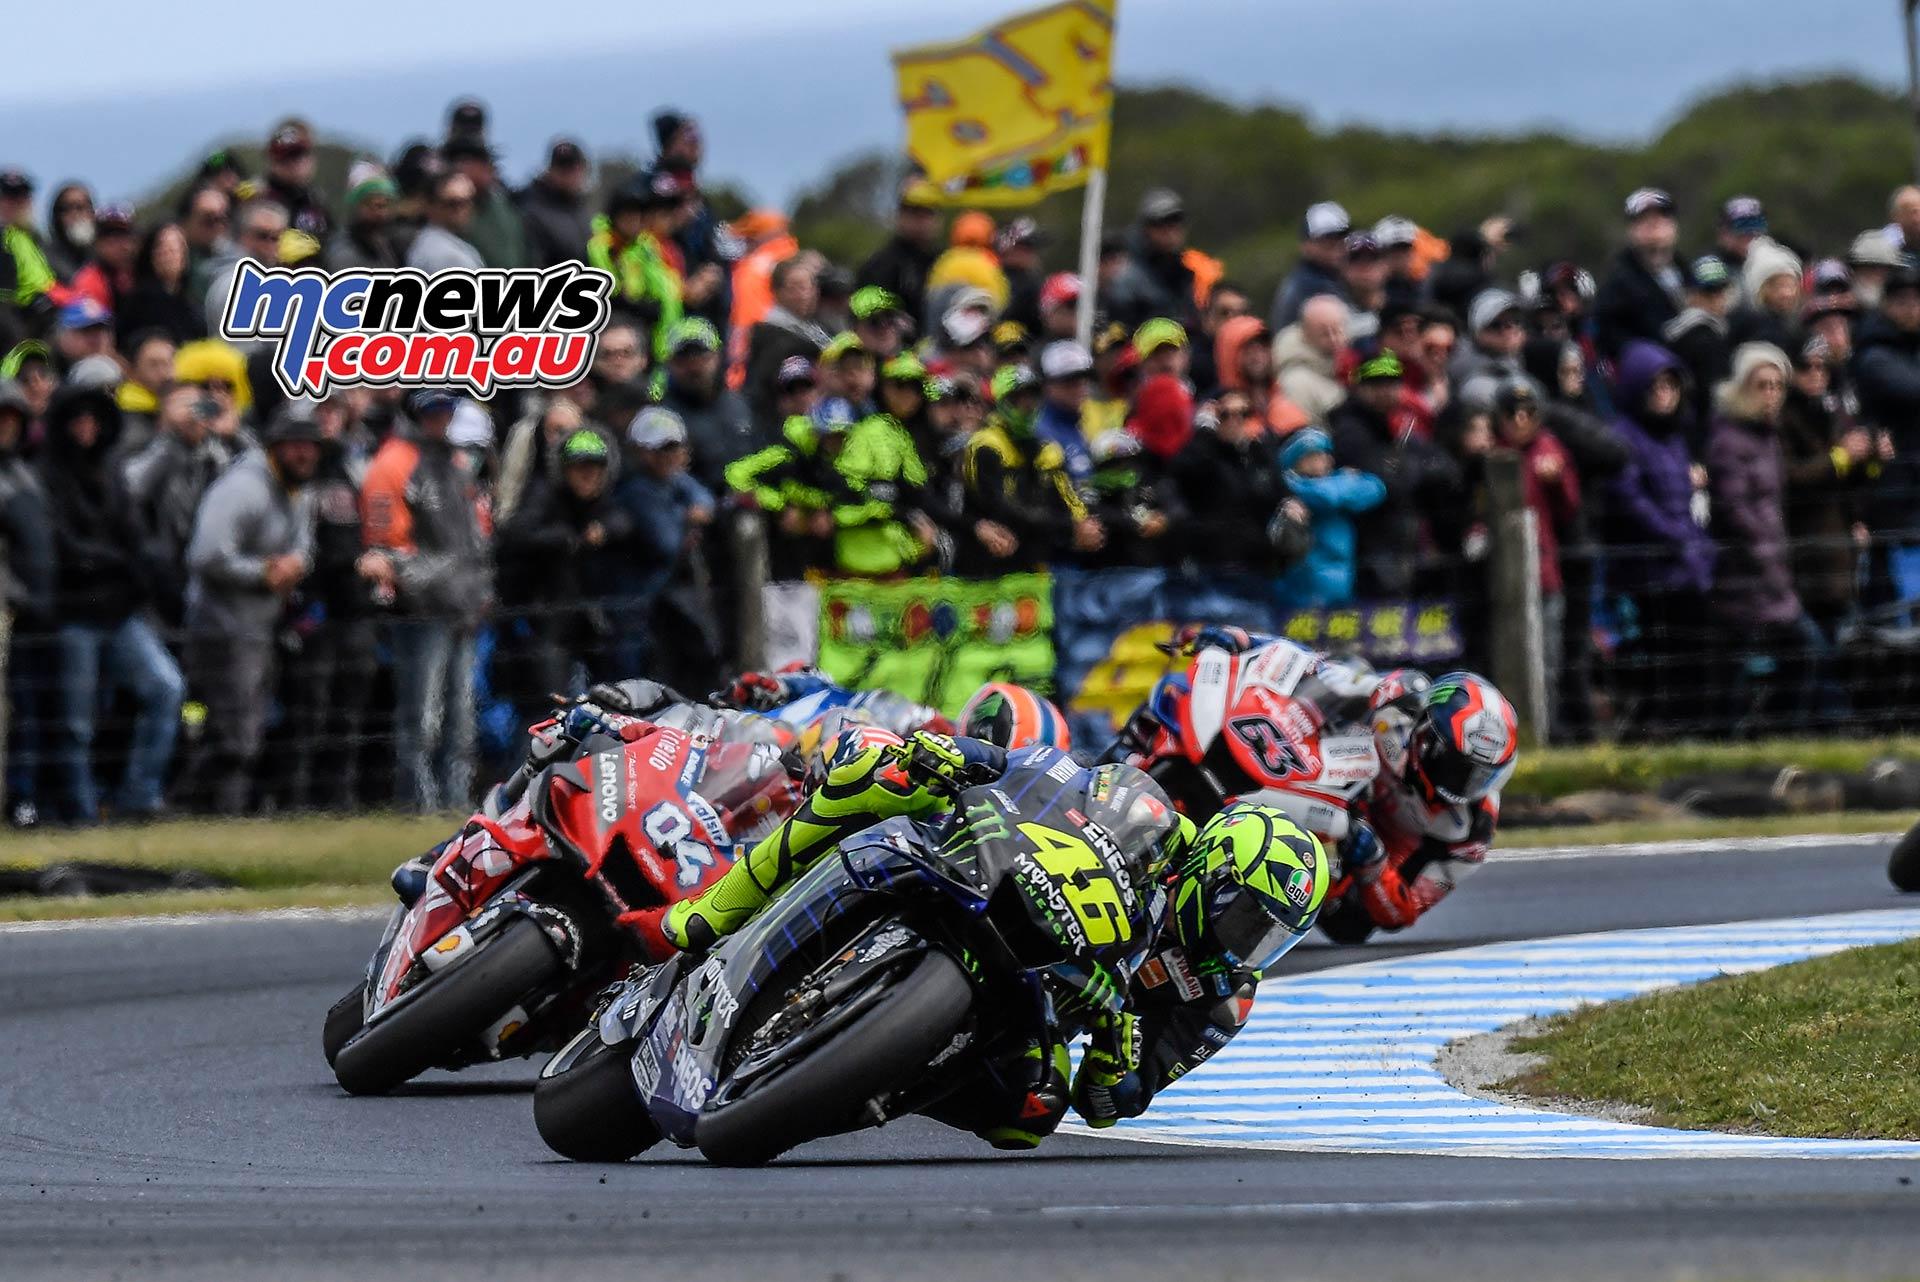 MotoGP Phillip Island Australia Race Rossi Dovi Crowd